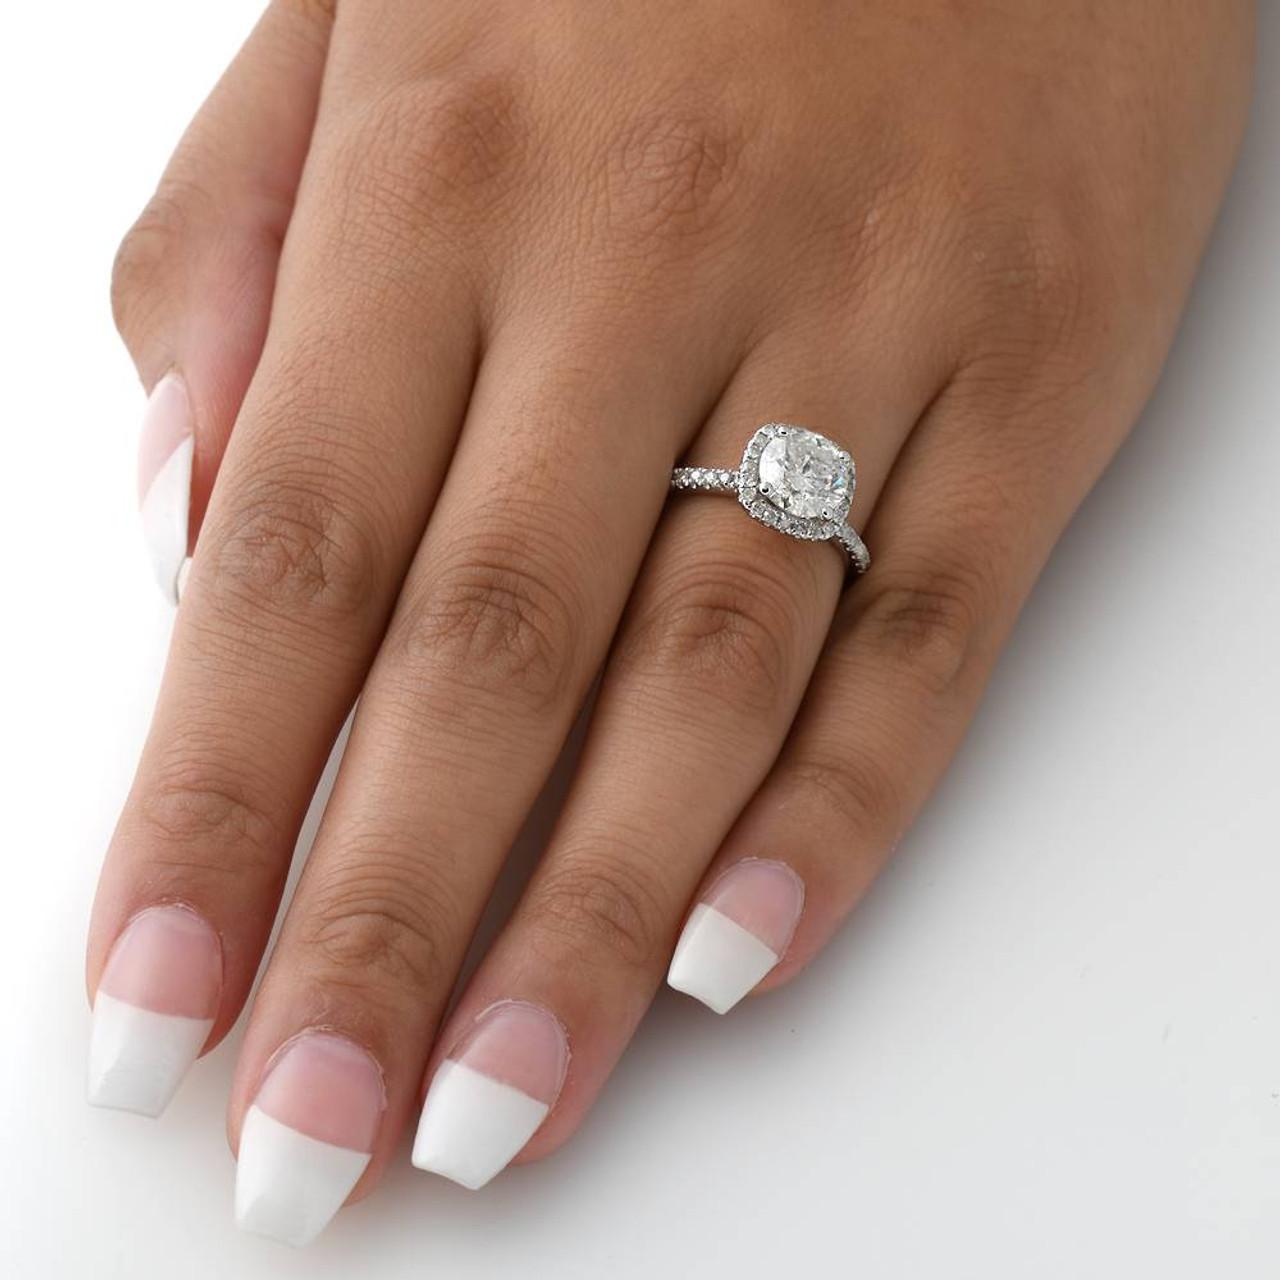 2 Cttw Diamond Engagement Ring Cushion Halo Round Cut 14k White Gold